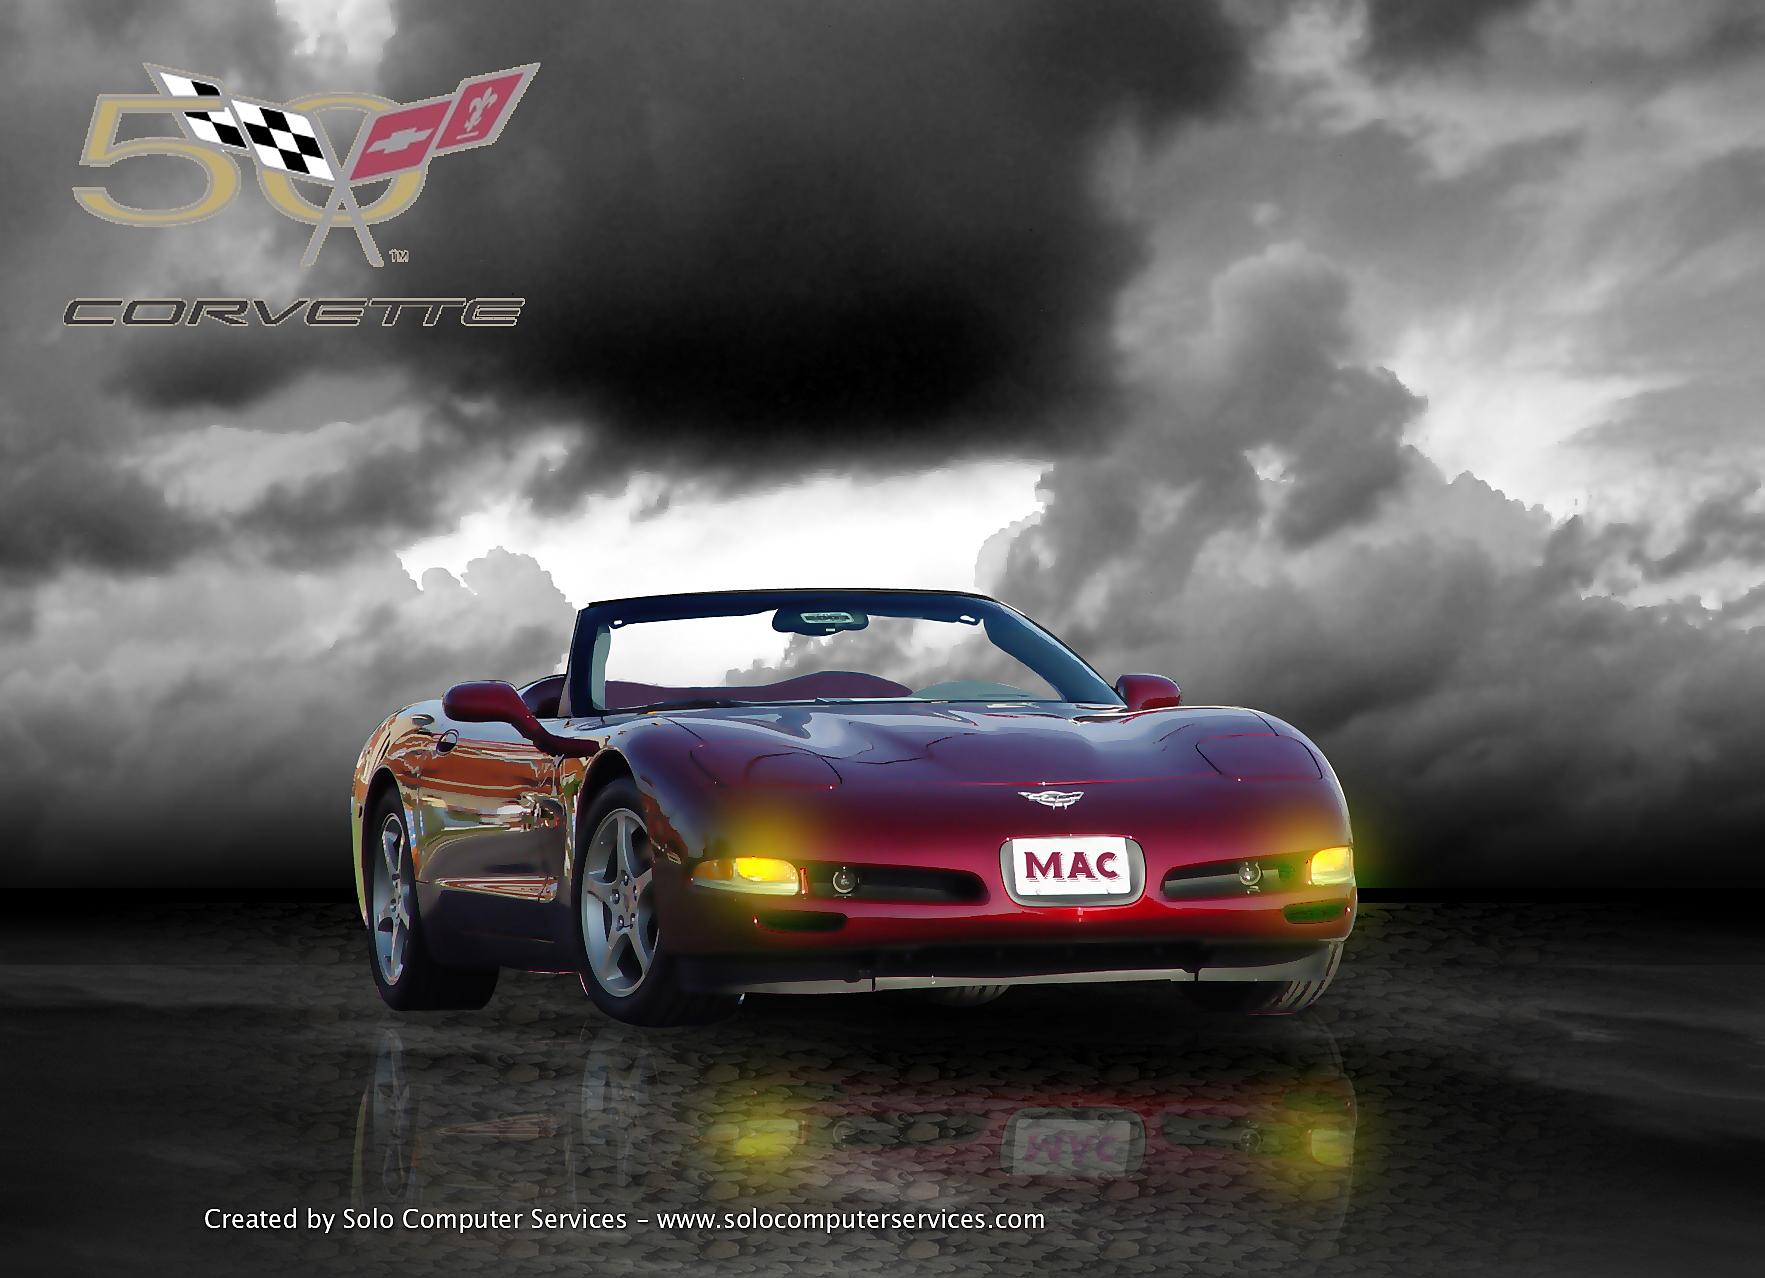 Corvette desktop wallpaper wallpapersafari - Corvette wallpaper ...